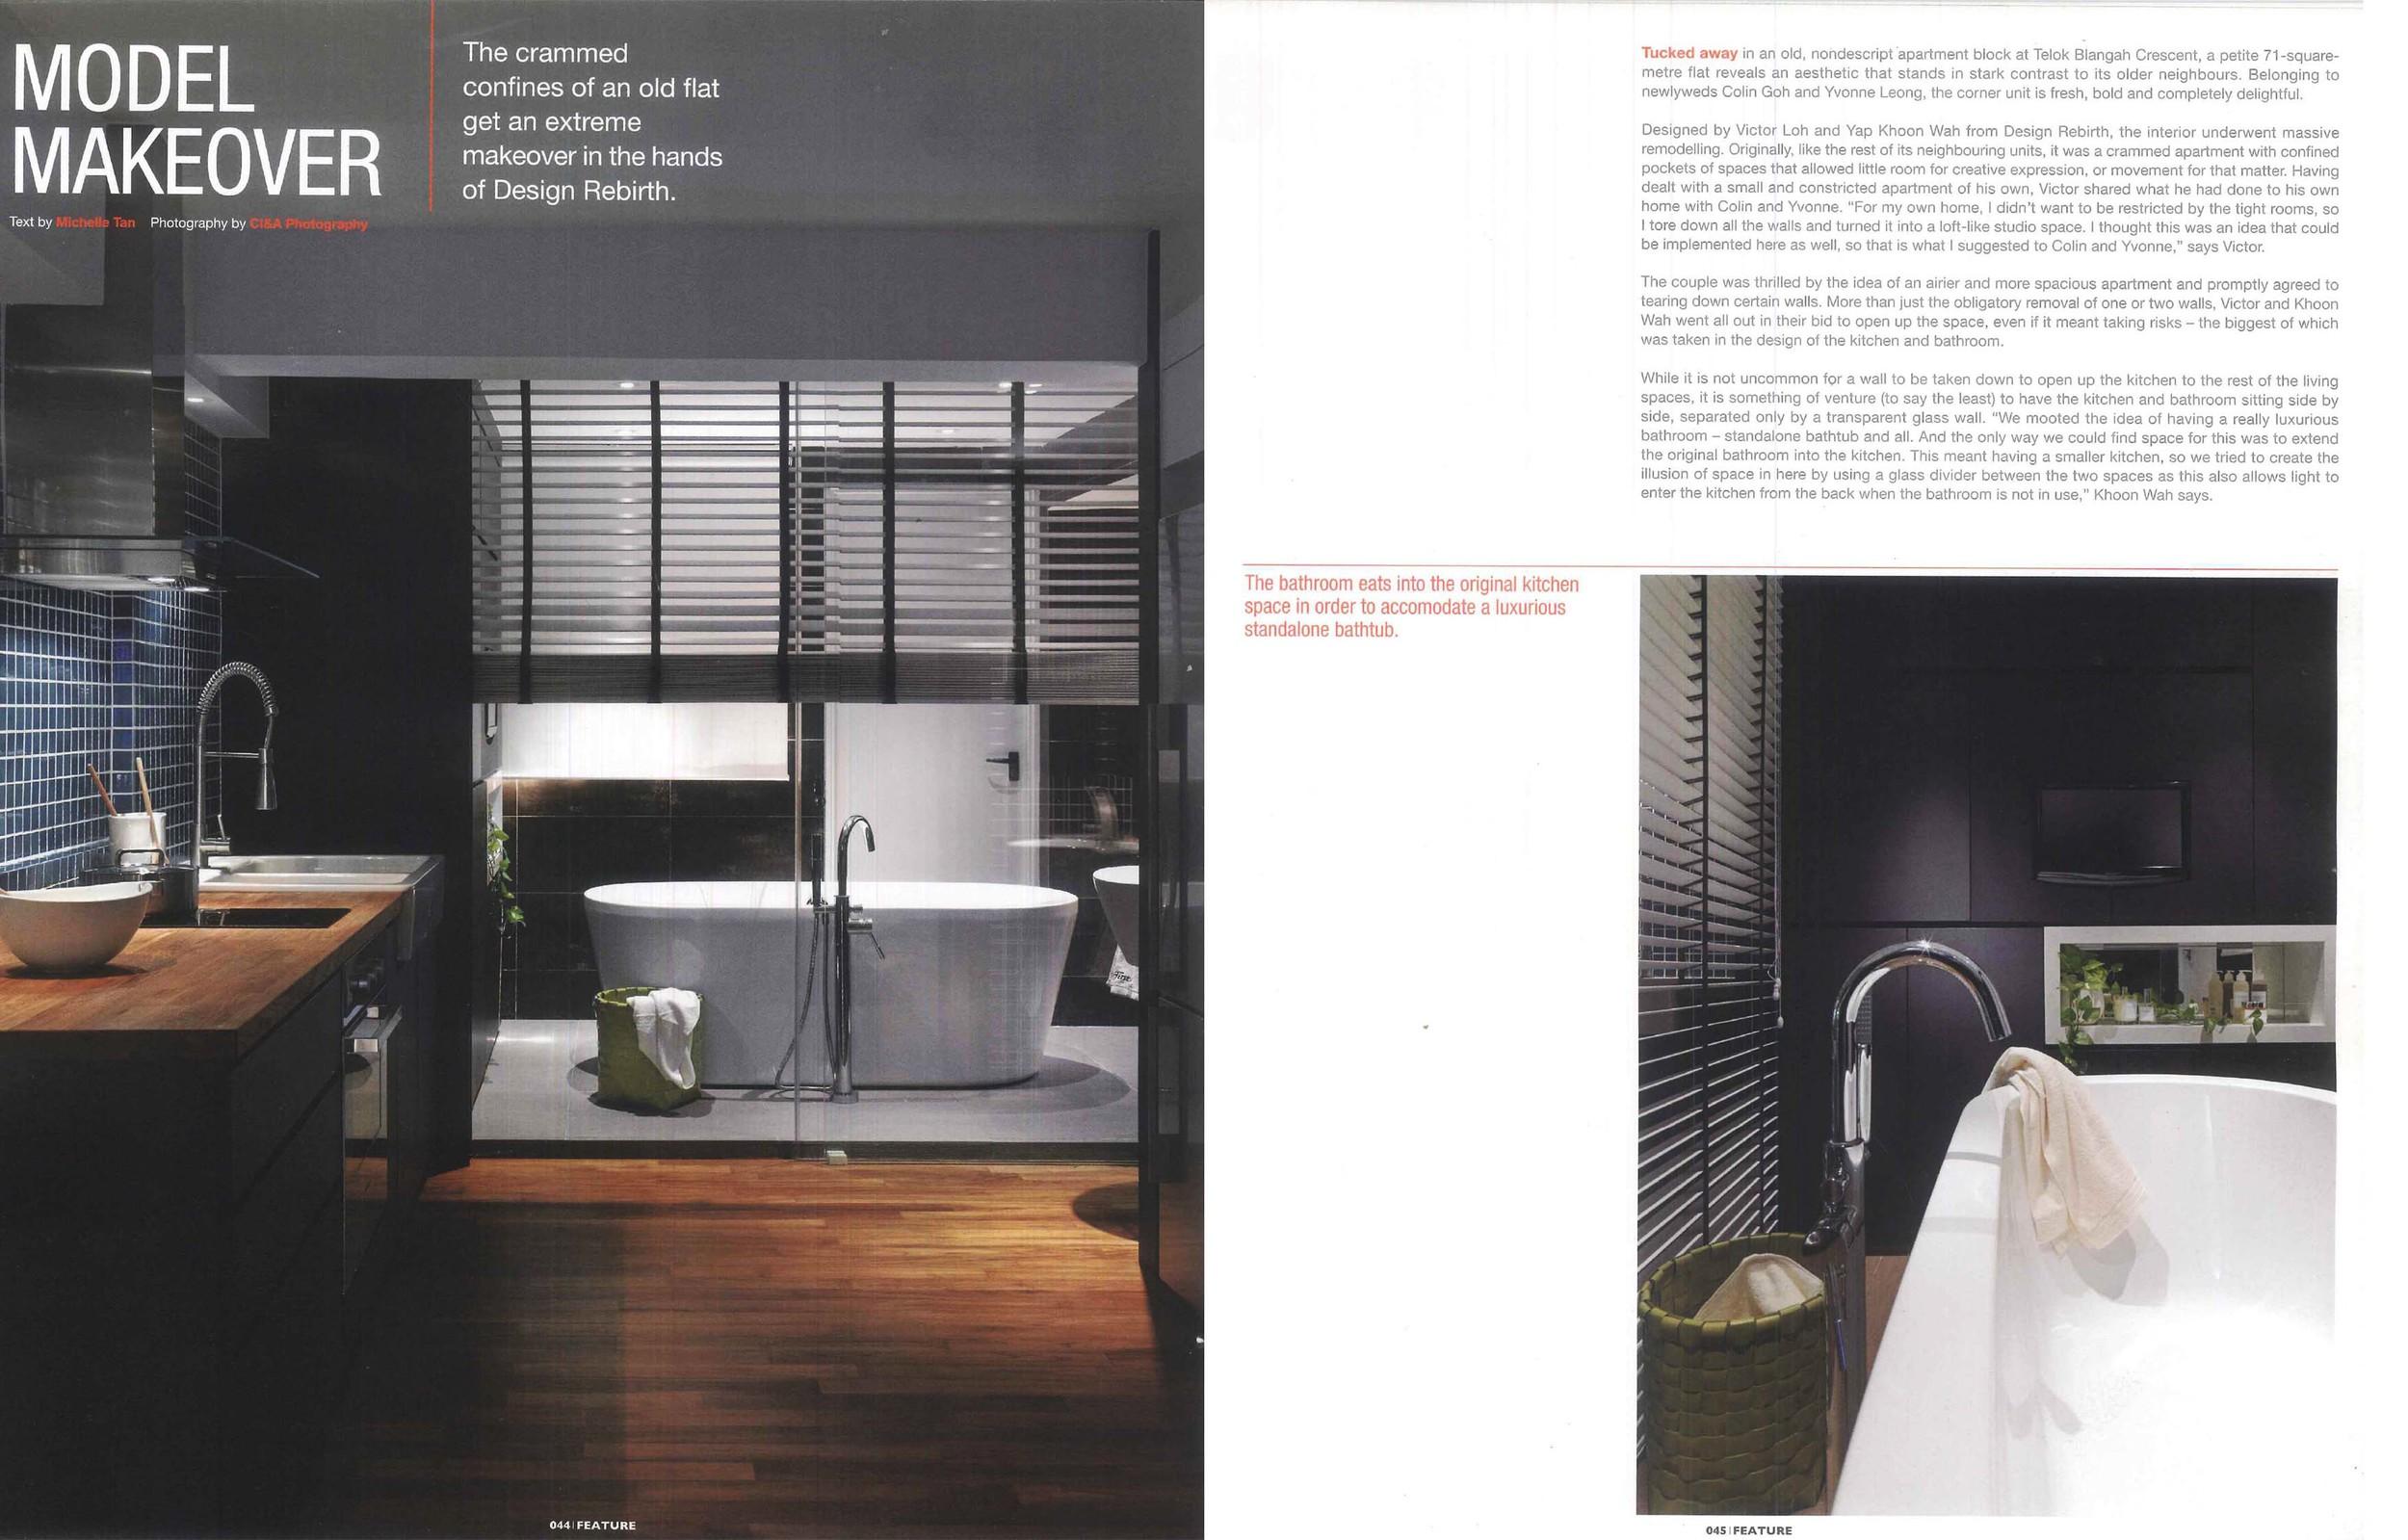 LOOKBOX KITCHEN & BATHROOMS 2 01.jpg